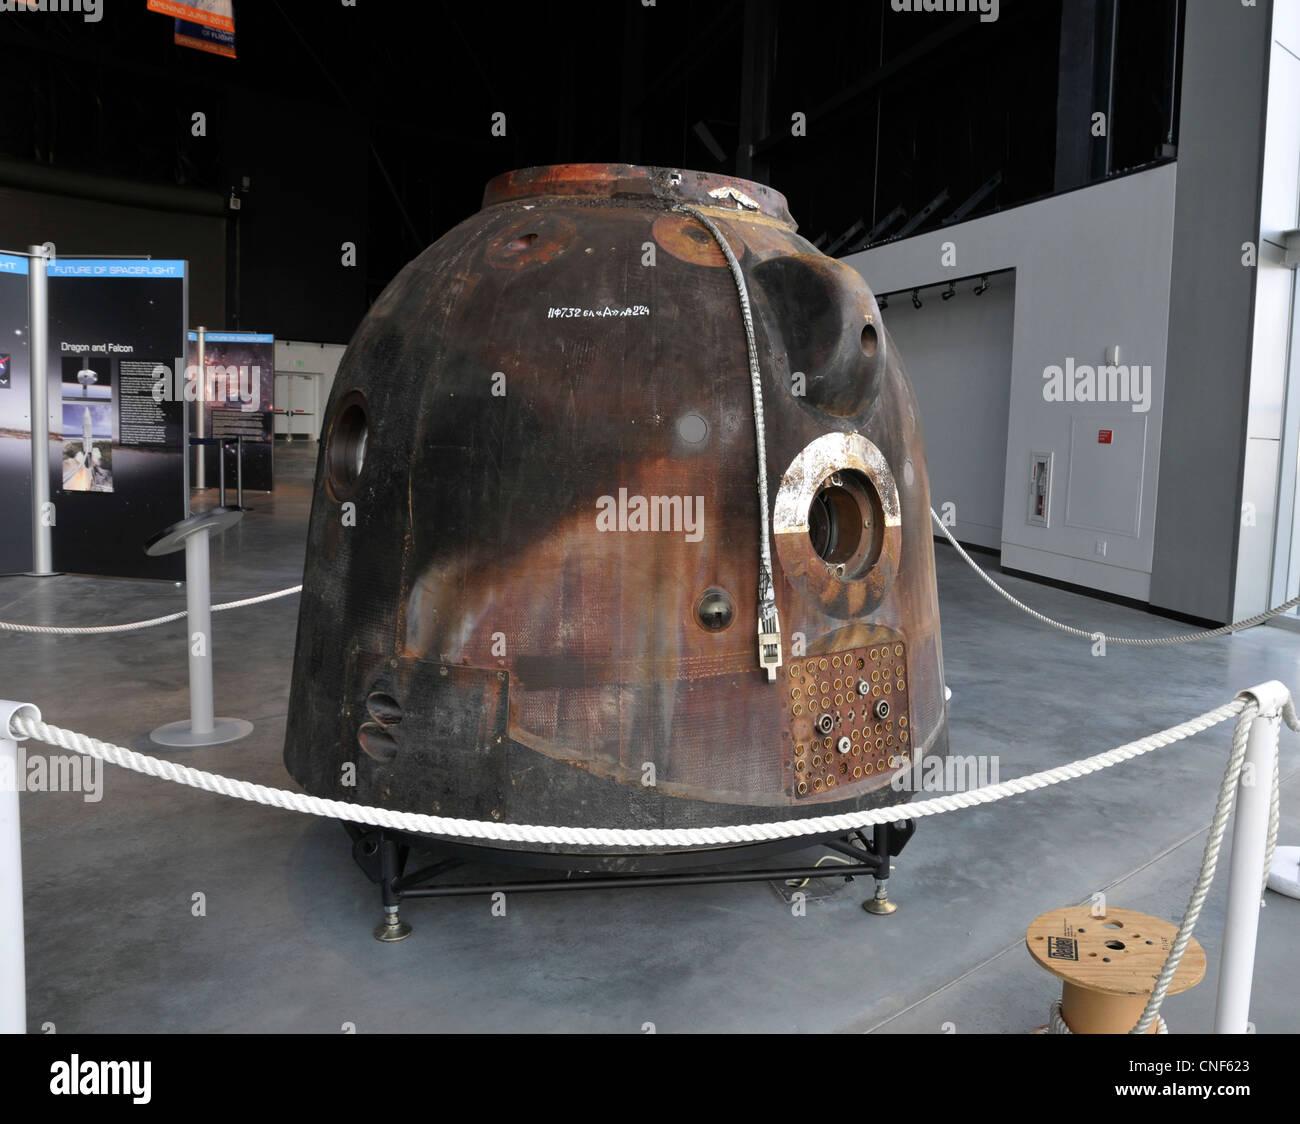 Soyuz TMA-14 descent module, The Museum of Flight, Seattle, Washington,WA, USA - Stock Image